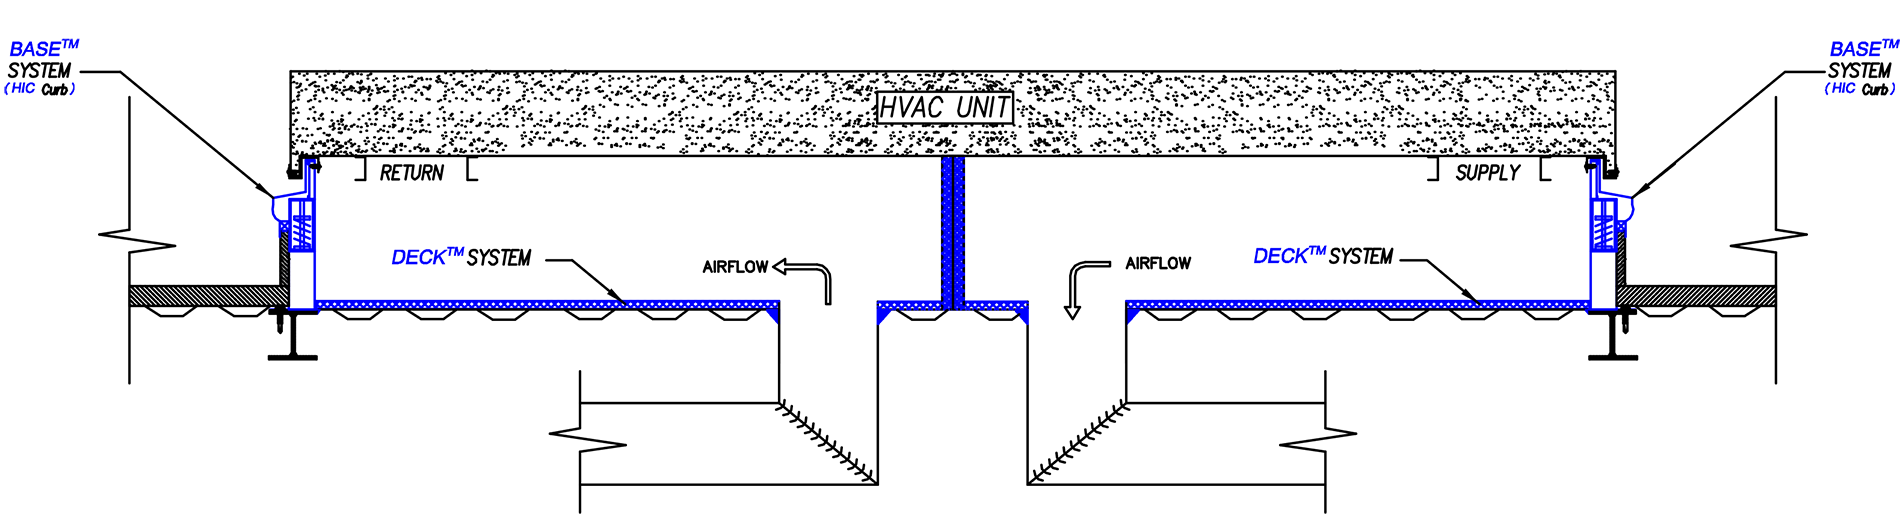 generic-hushcore-whisper-p-system-rtu-curb-acoustical-system